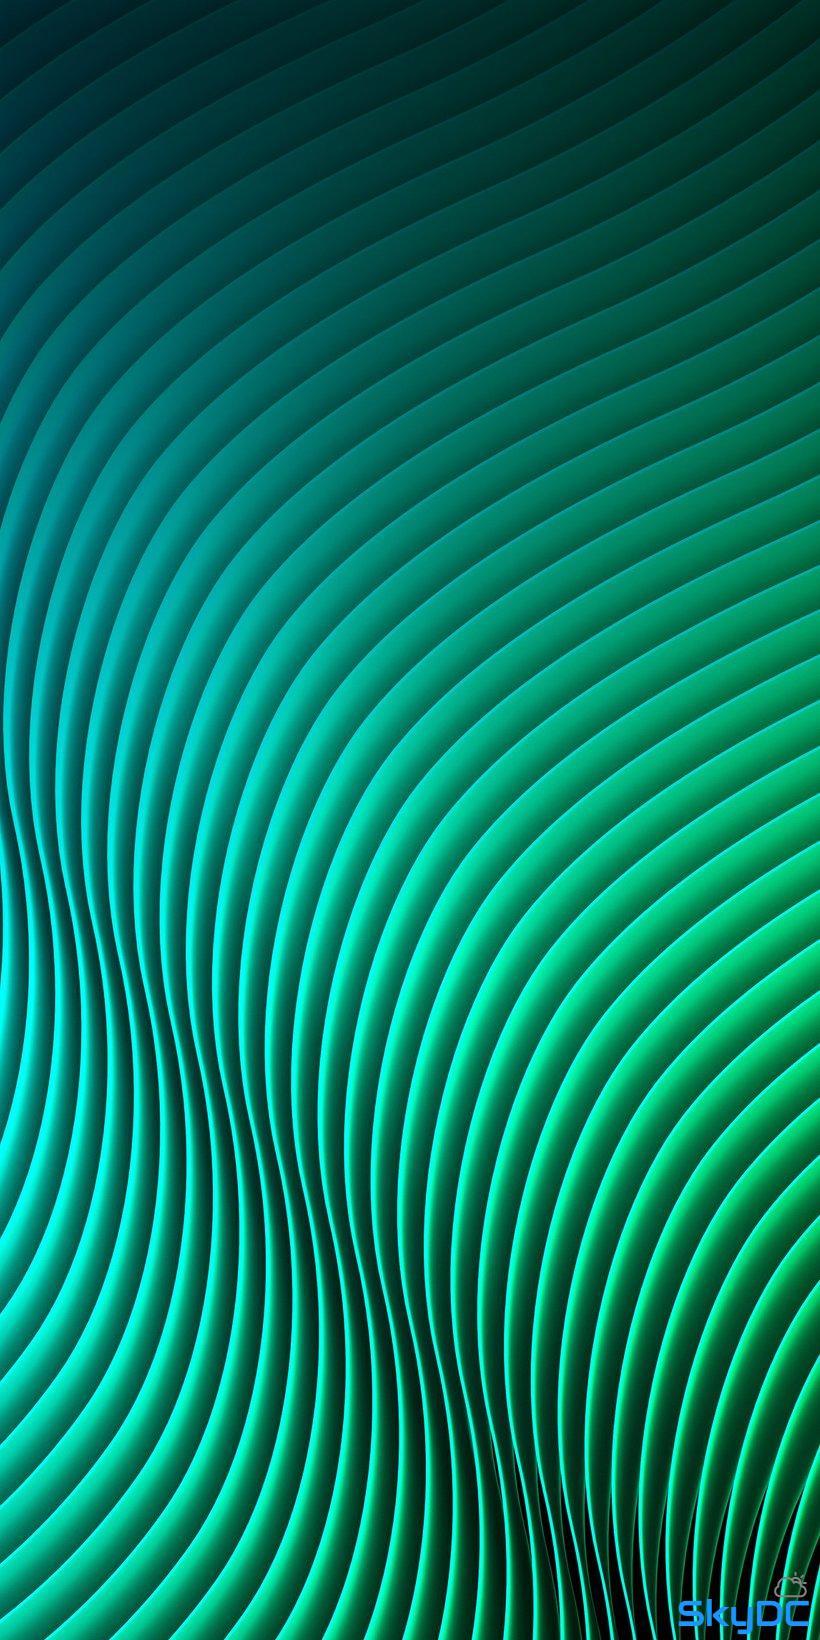 LG V30 공식 벨소리, 배경화면 (Ringtones, Notifications, Alarms, Wallpapers)